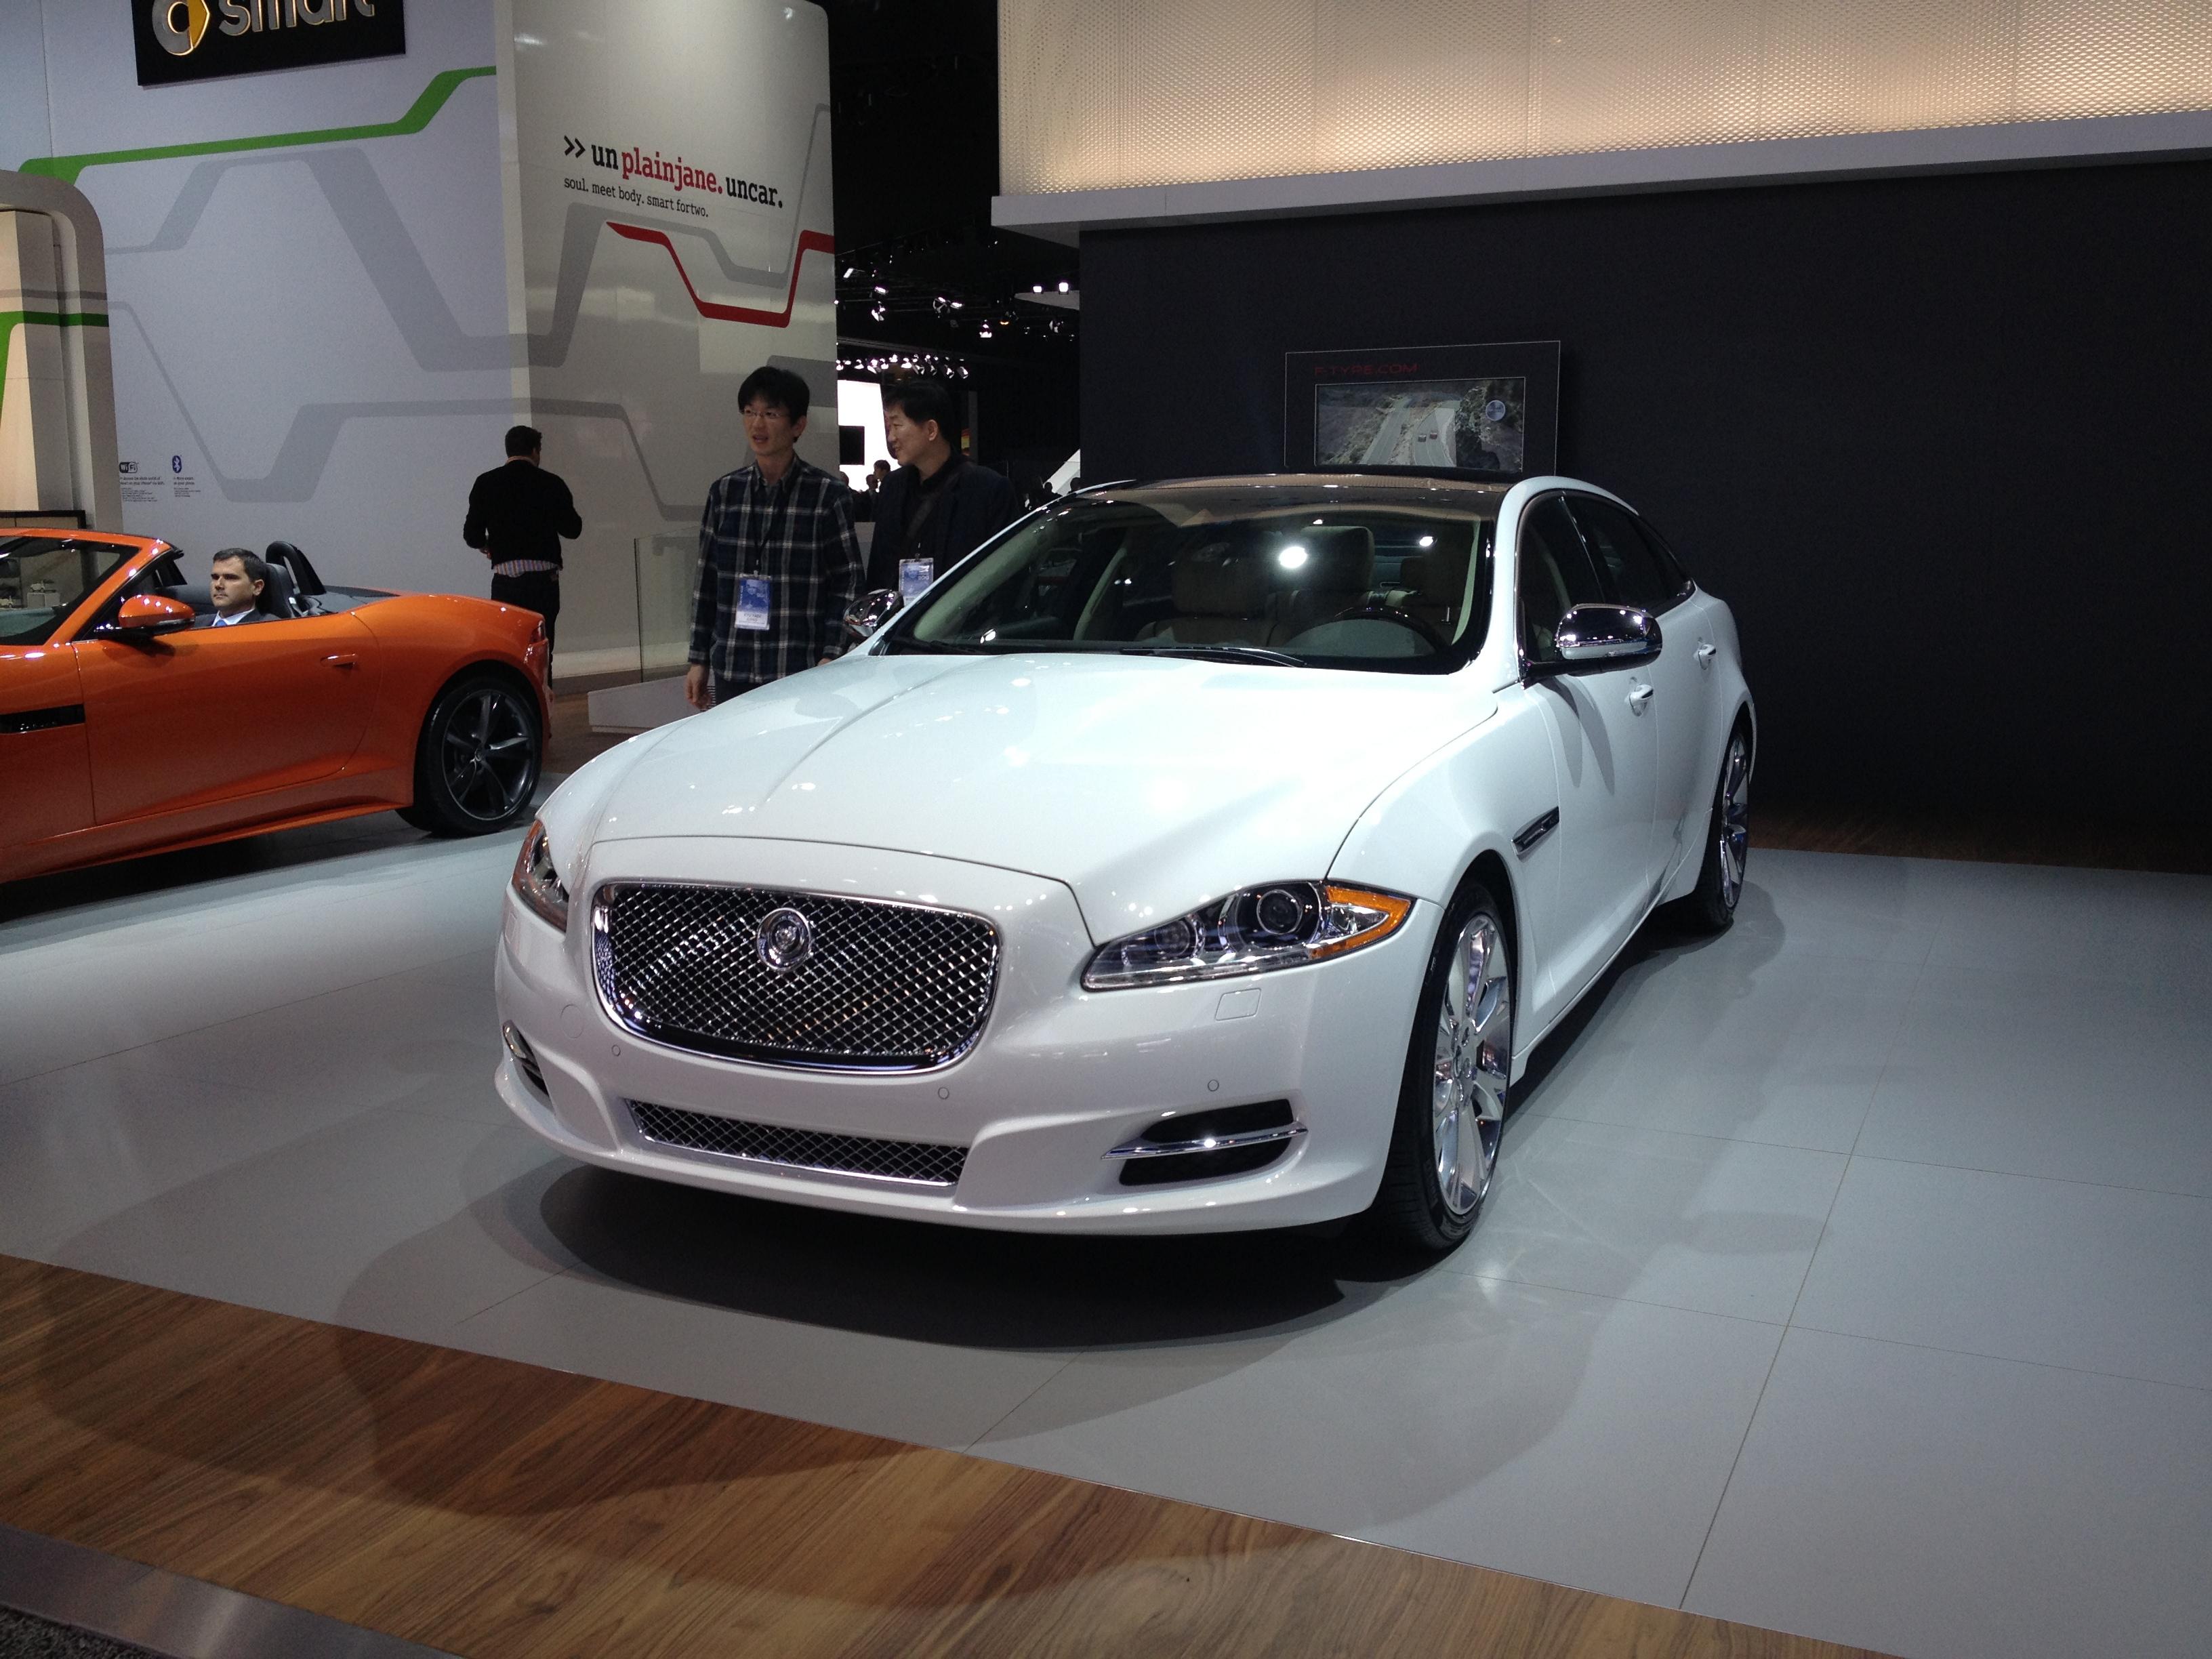 large cashmere research groovecar composite jaguar supersport xj supercharged sedan